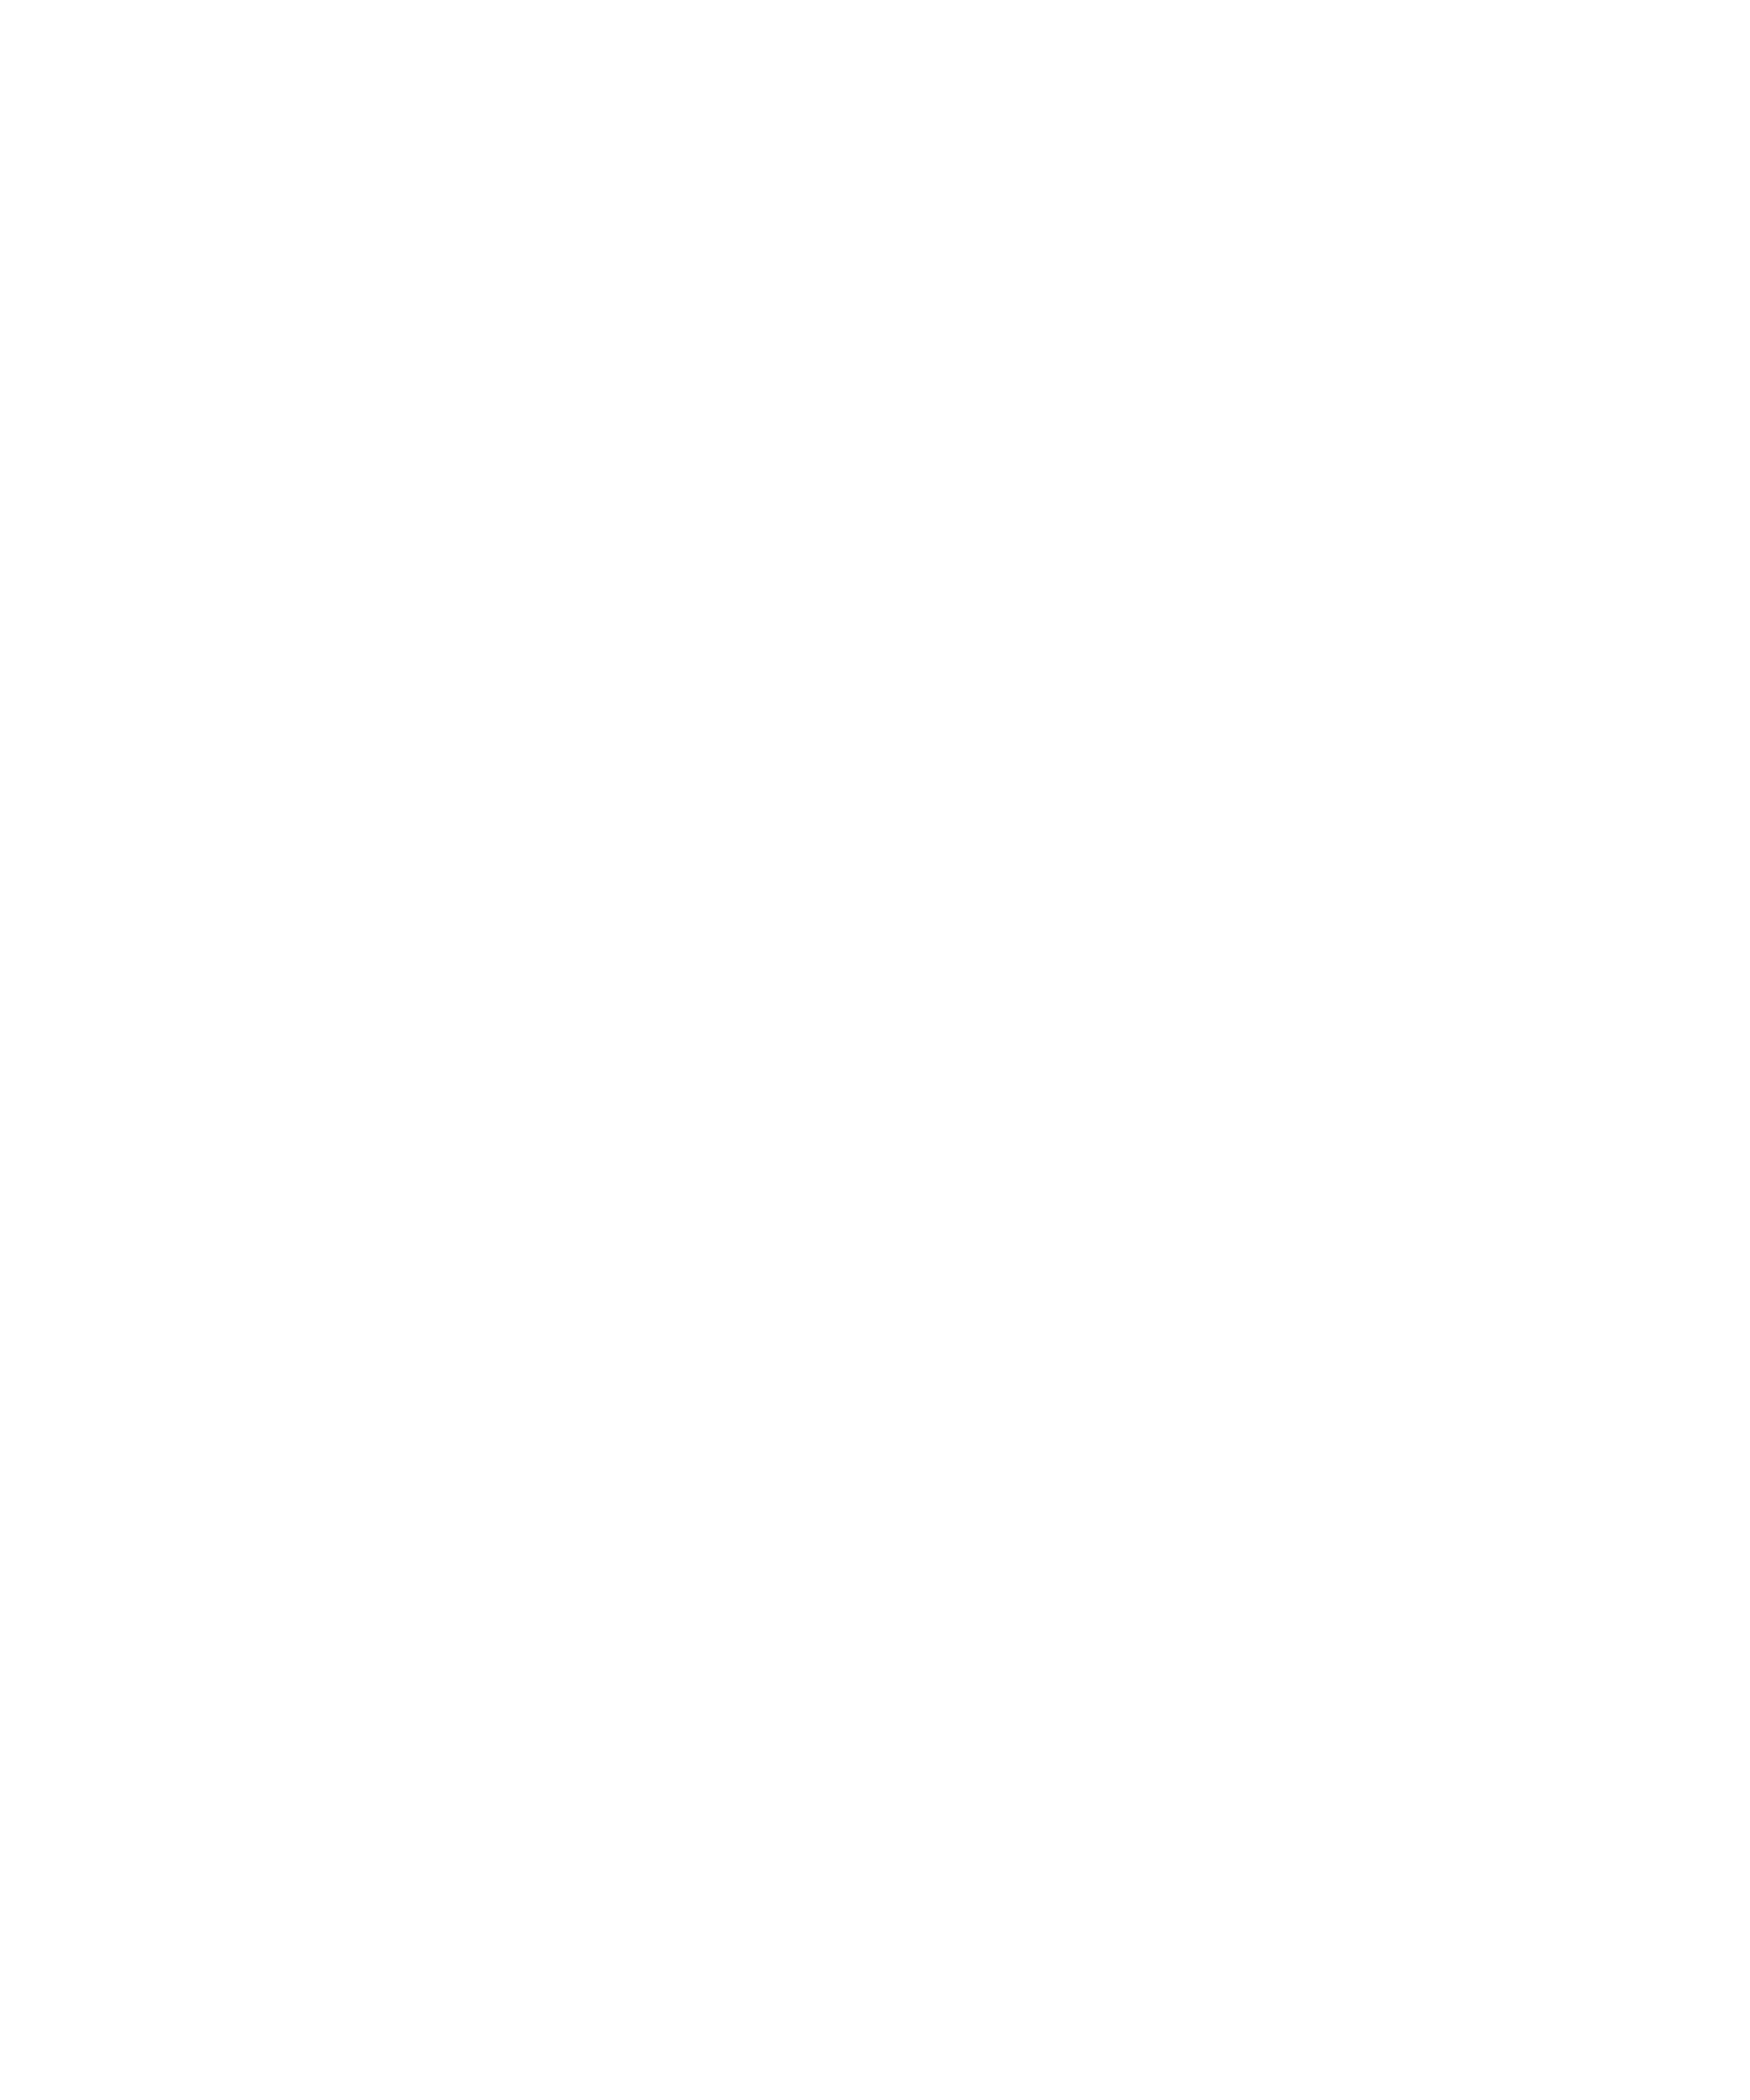 Grueblhof_Website_32